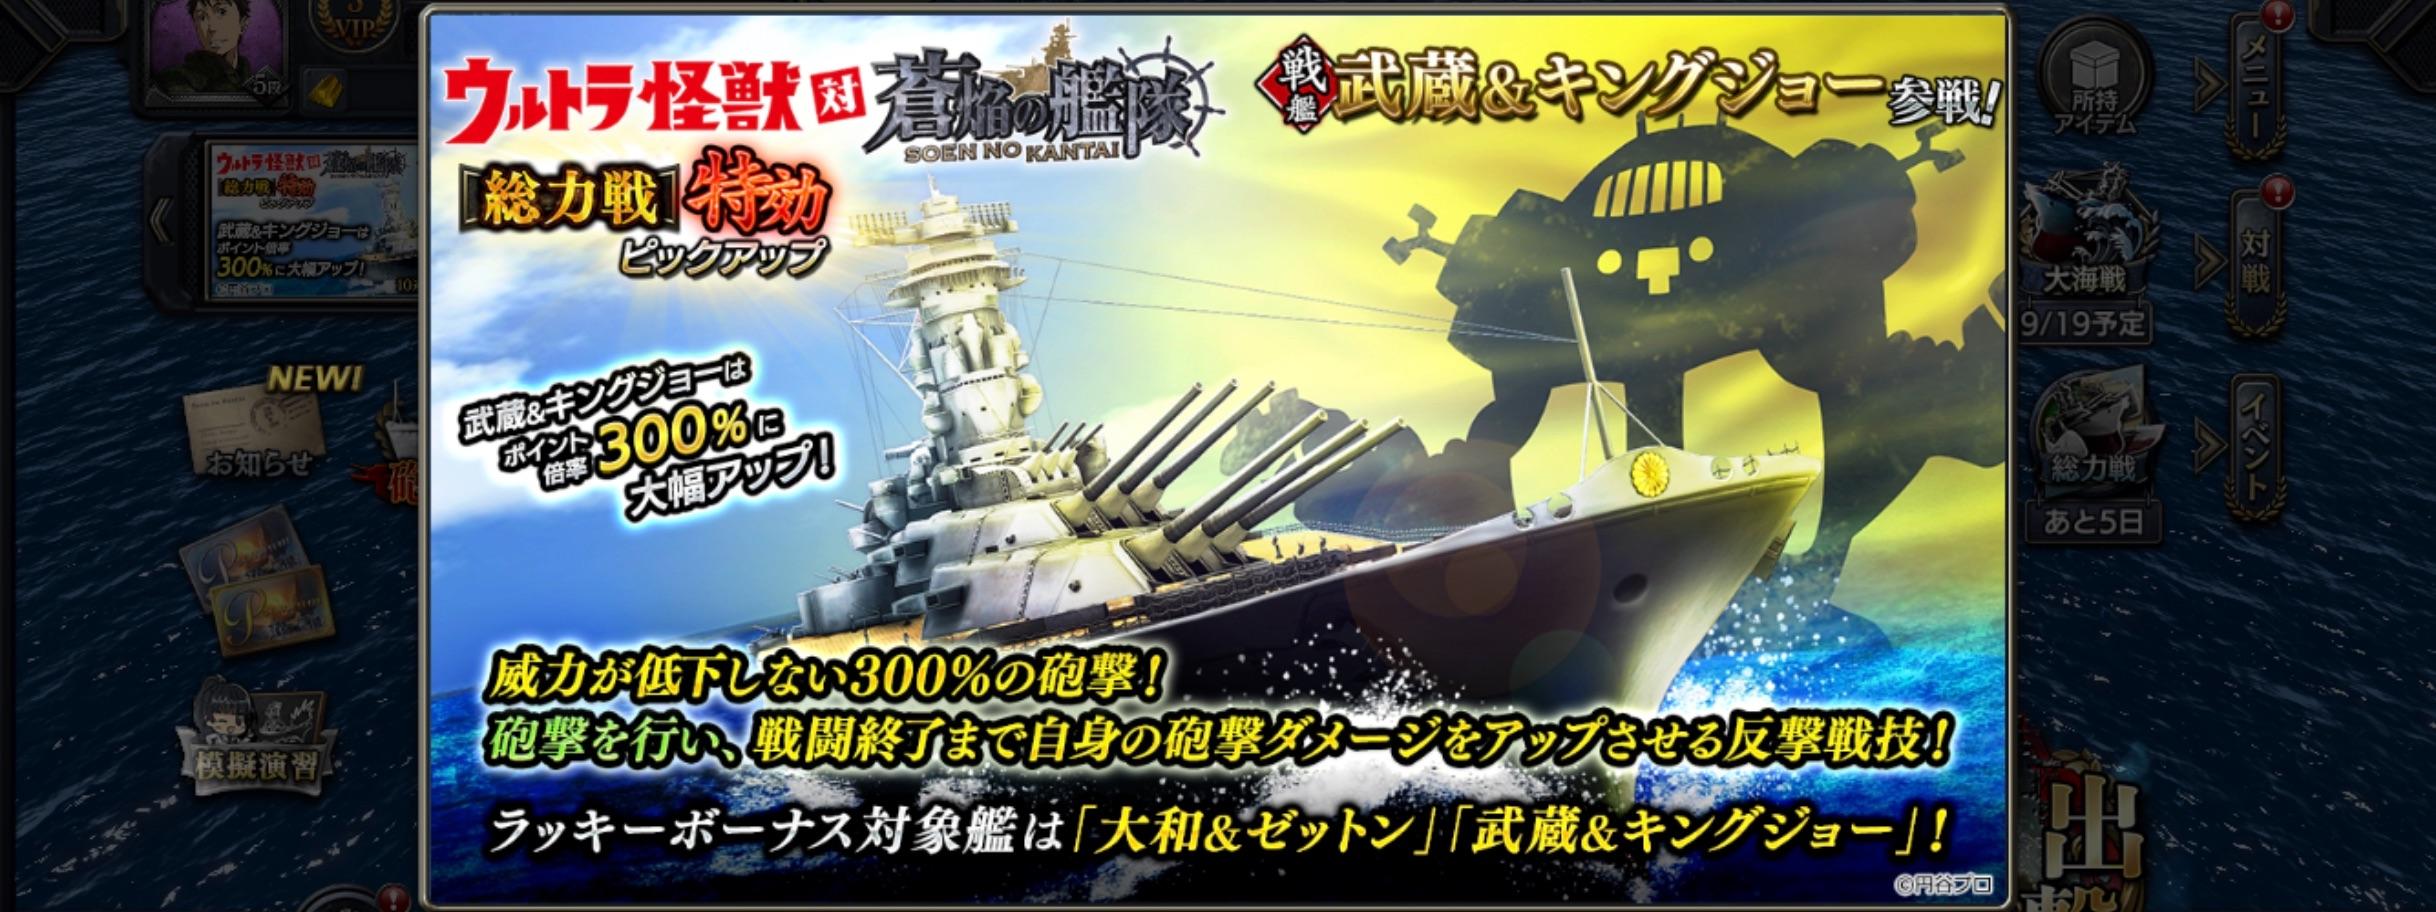 battleship-MusashiK